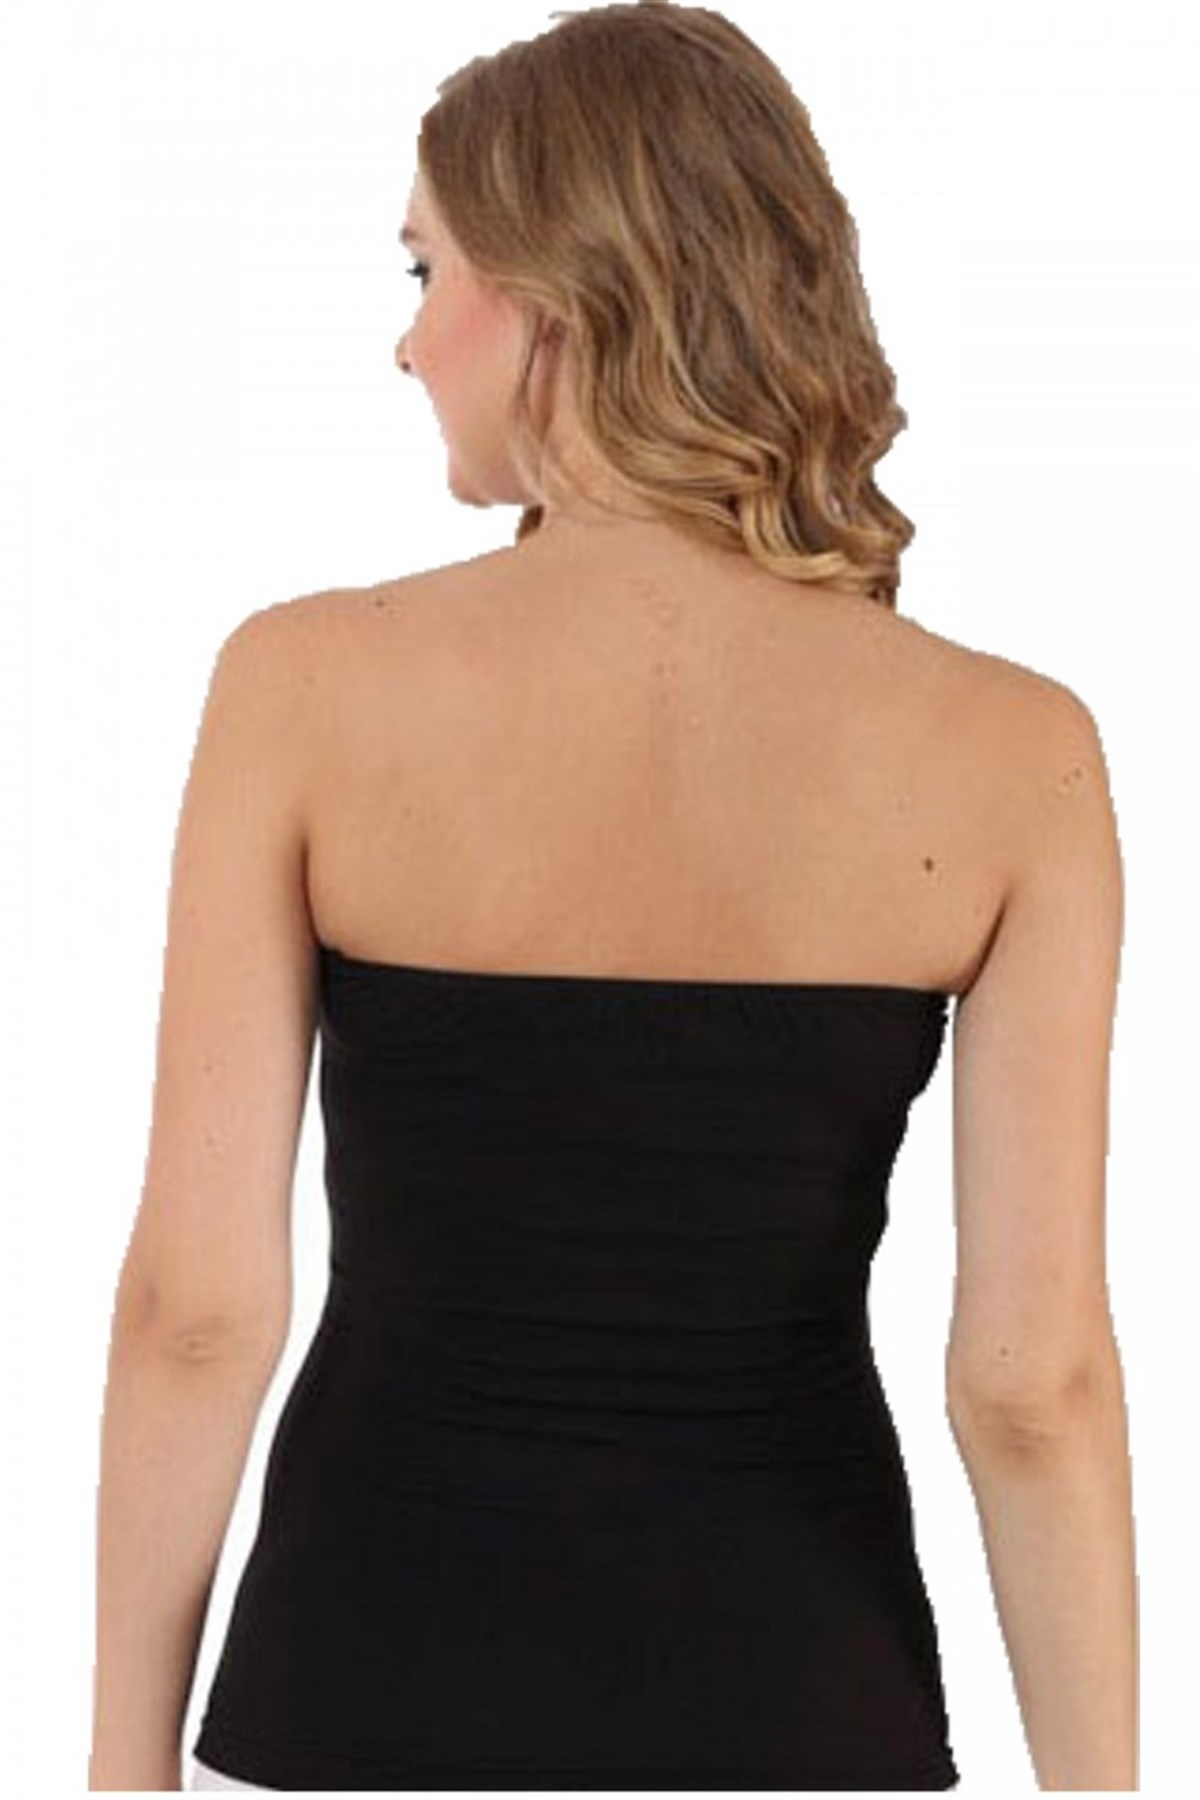 Moda Çizgi Bayan Straples Body 255